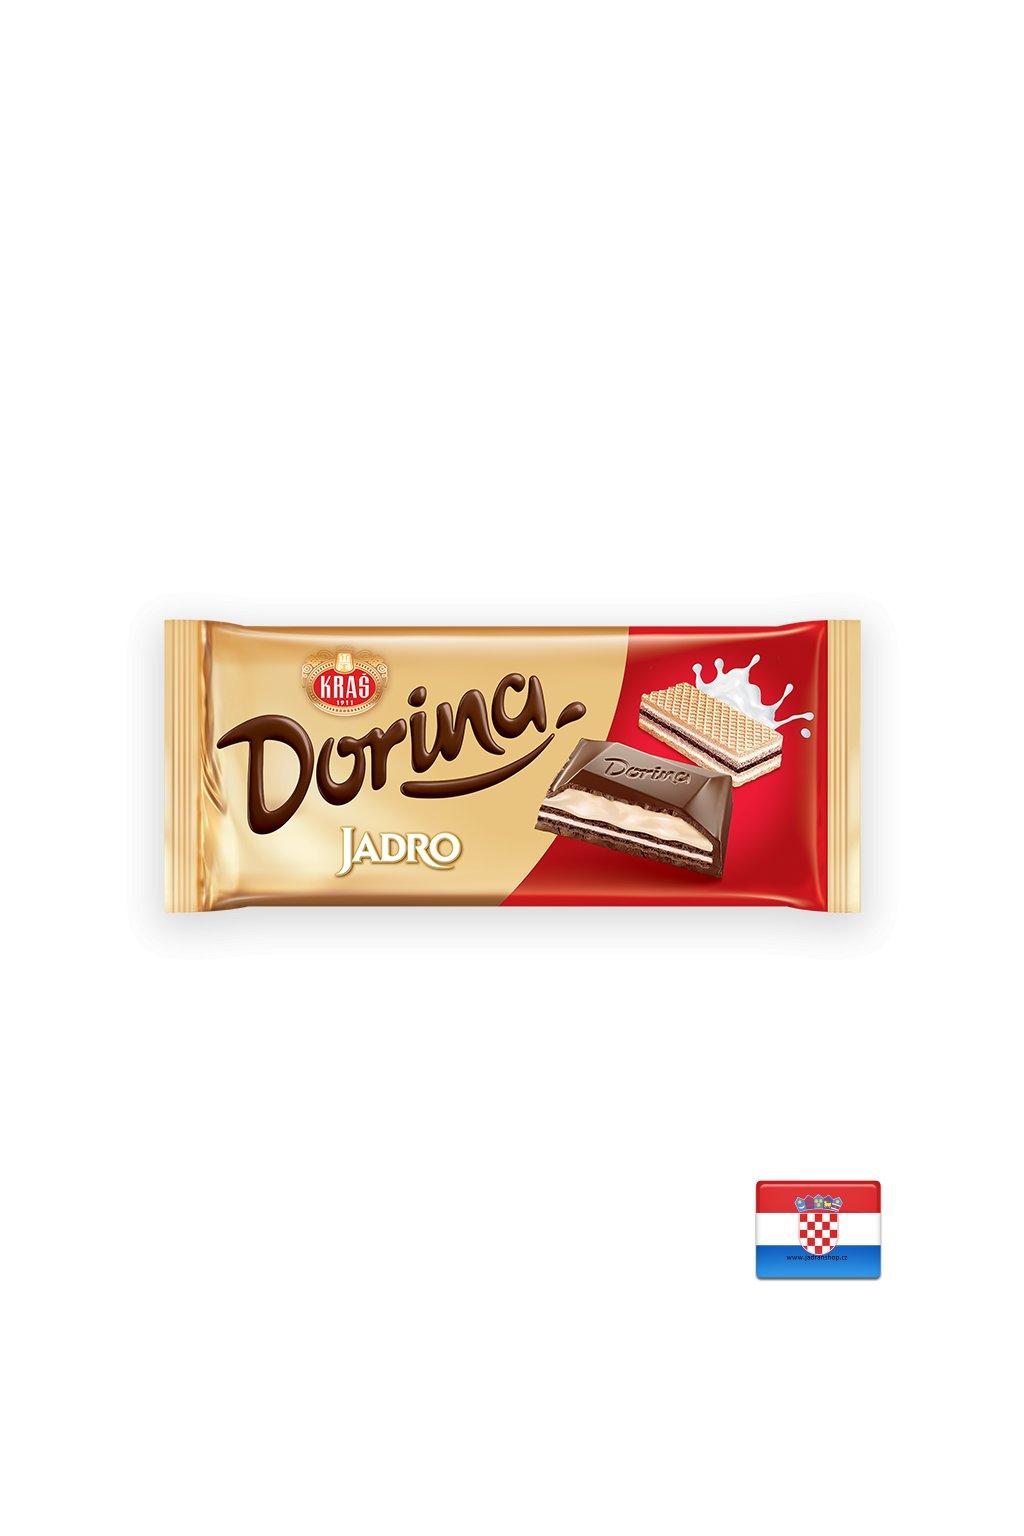 Czekolada Dorina z ciasteczkami Jadro 100g